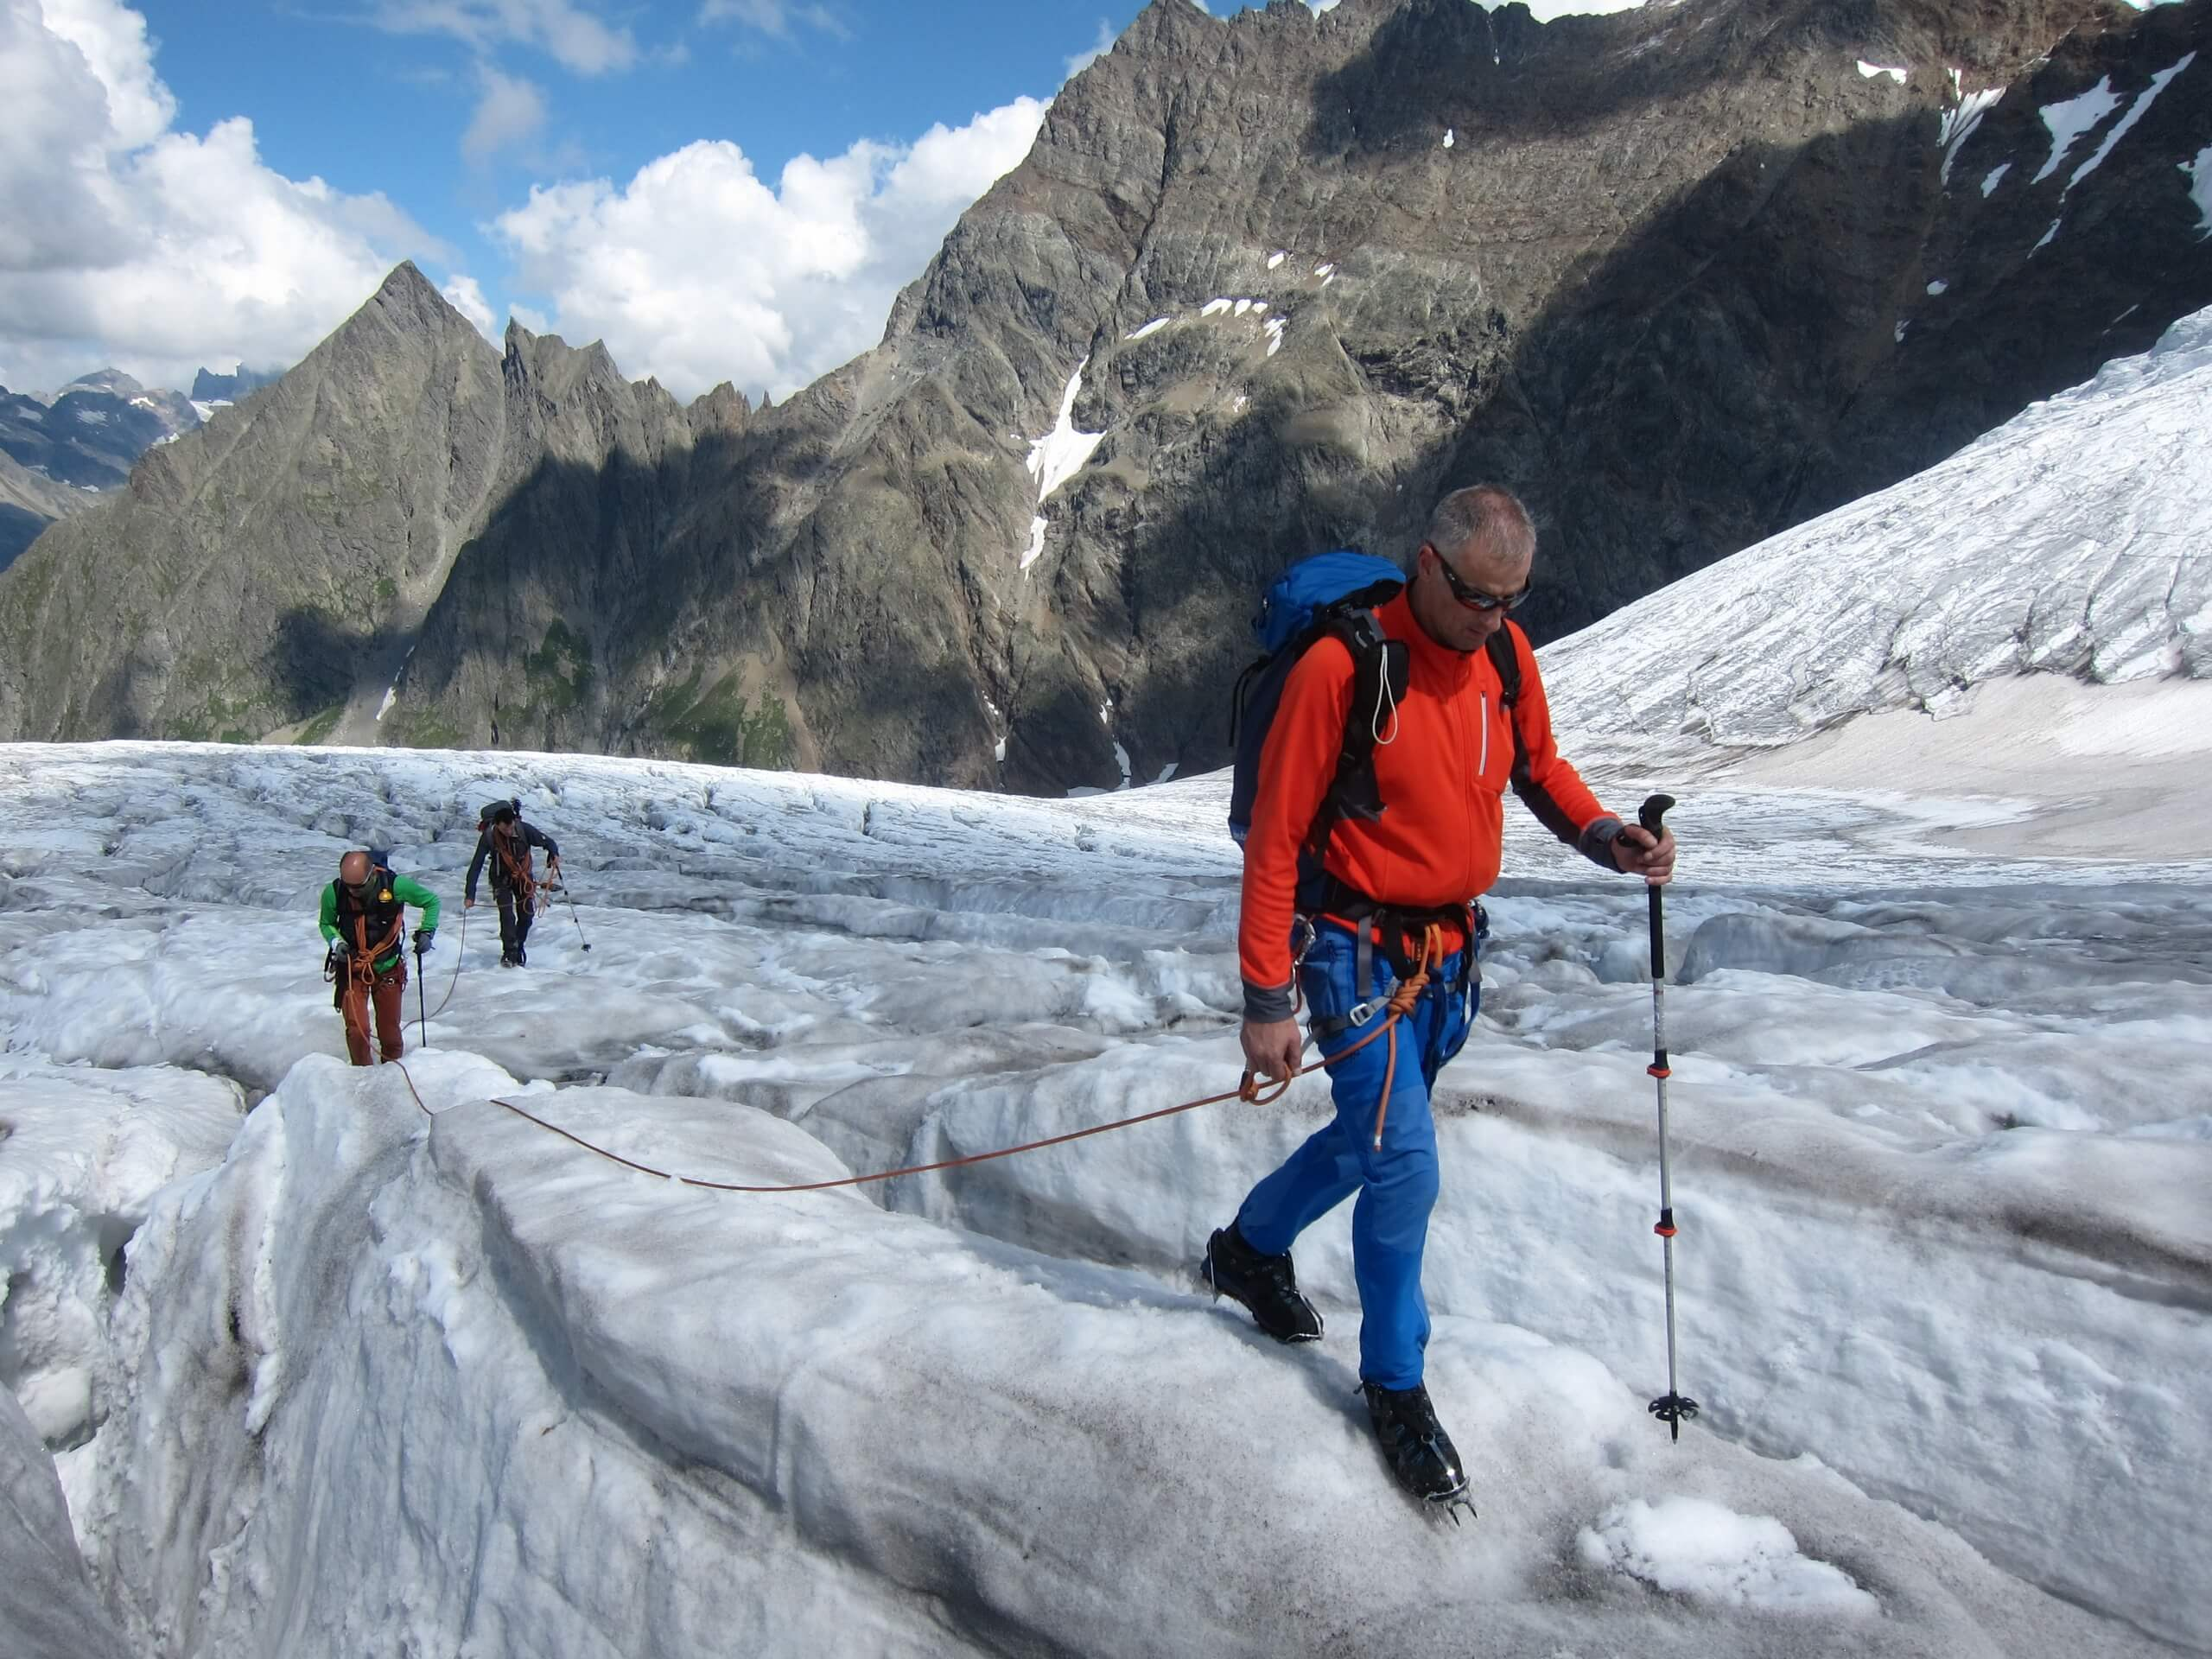 alpinschule-bergfalke-thun-gletschertrekking-winter